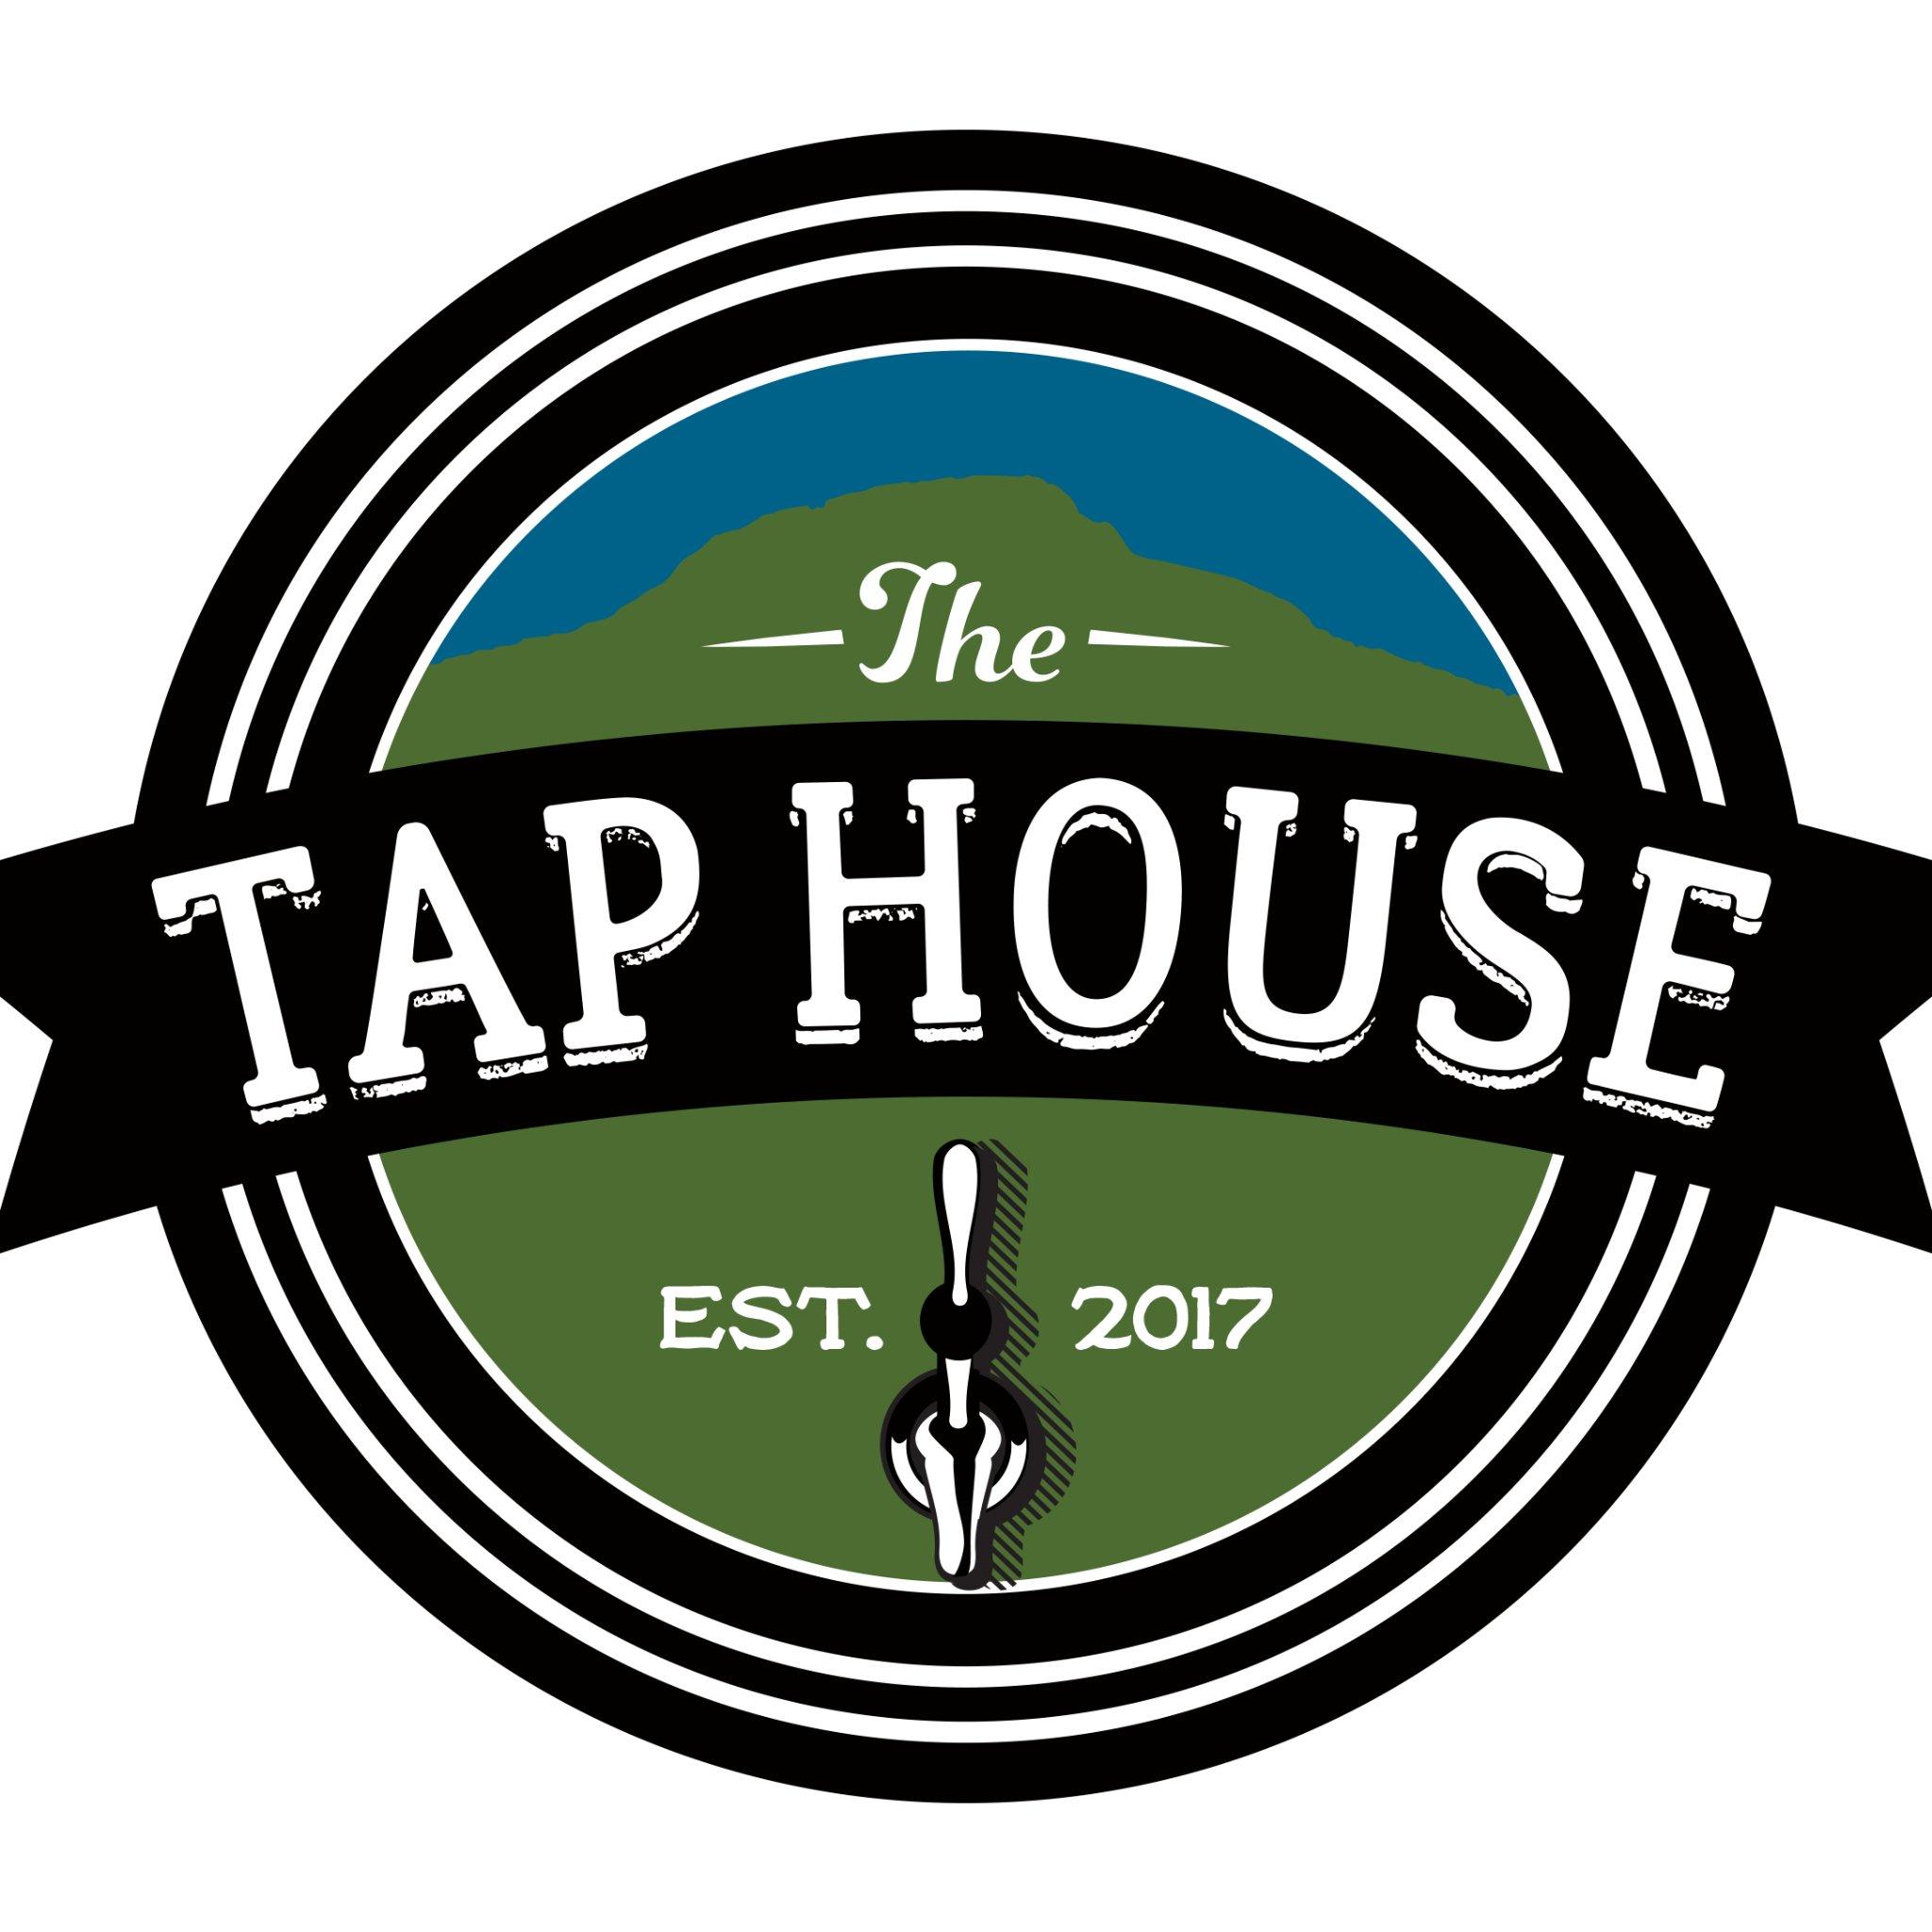 The Tap House taphousechatt